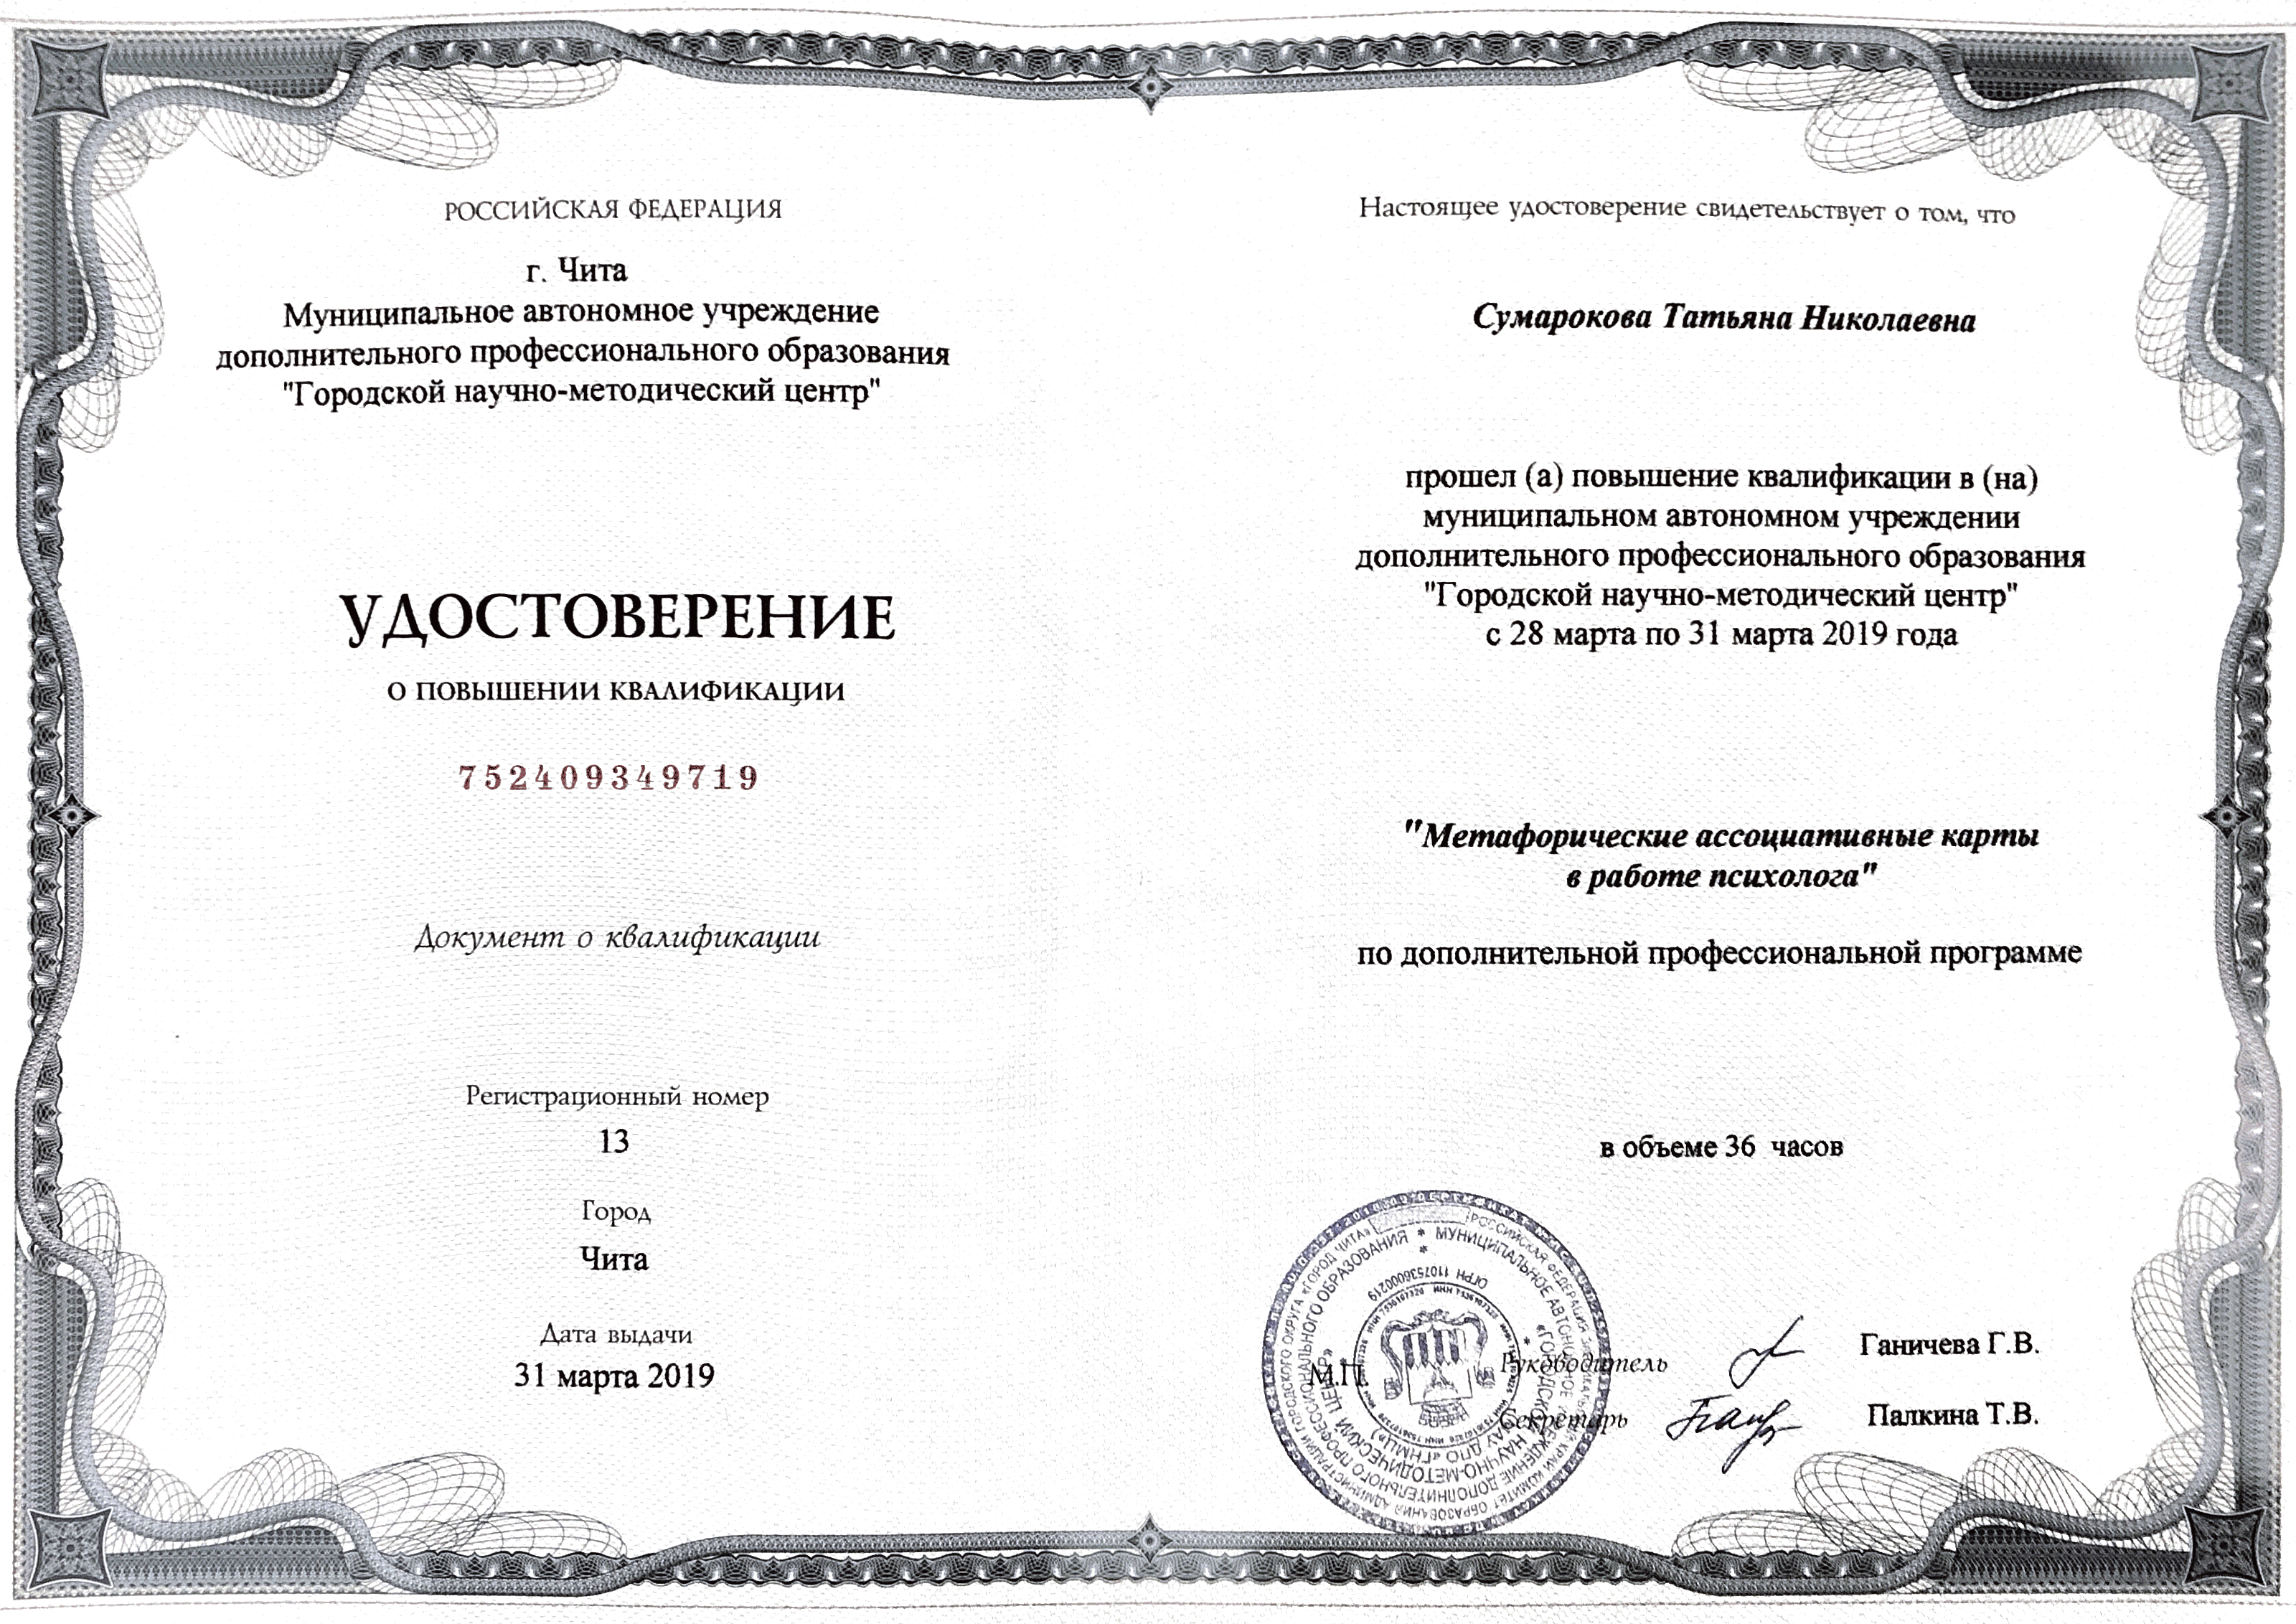 Документ Scannable создан 17 мая 2019 г.